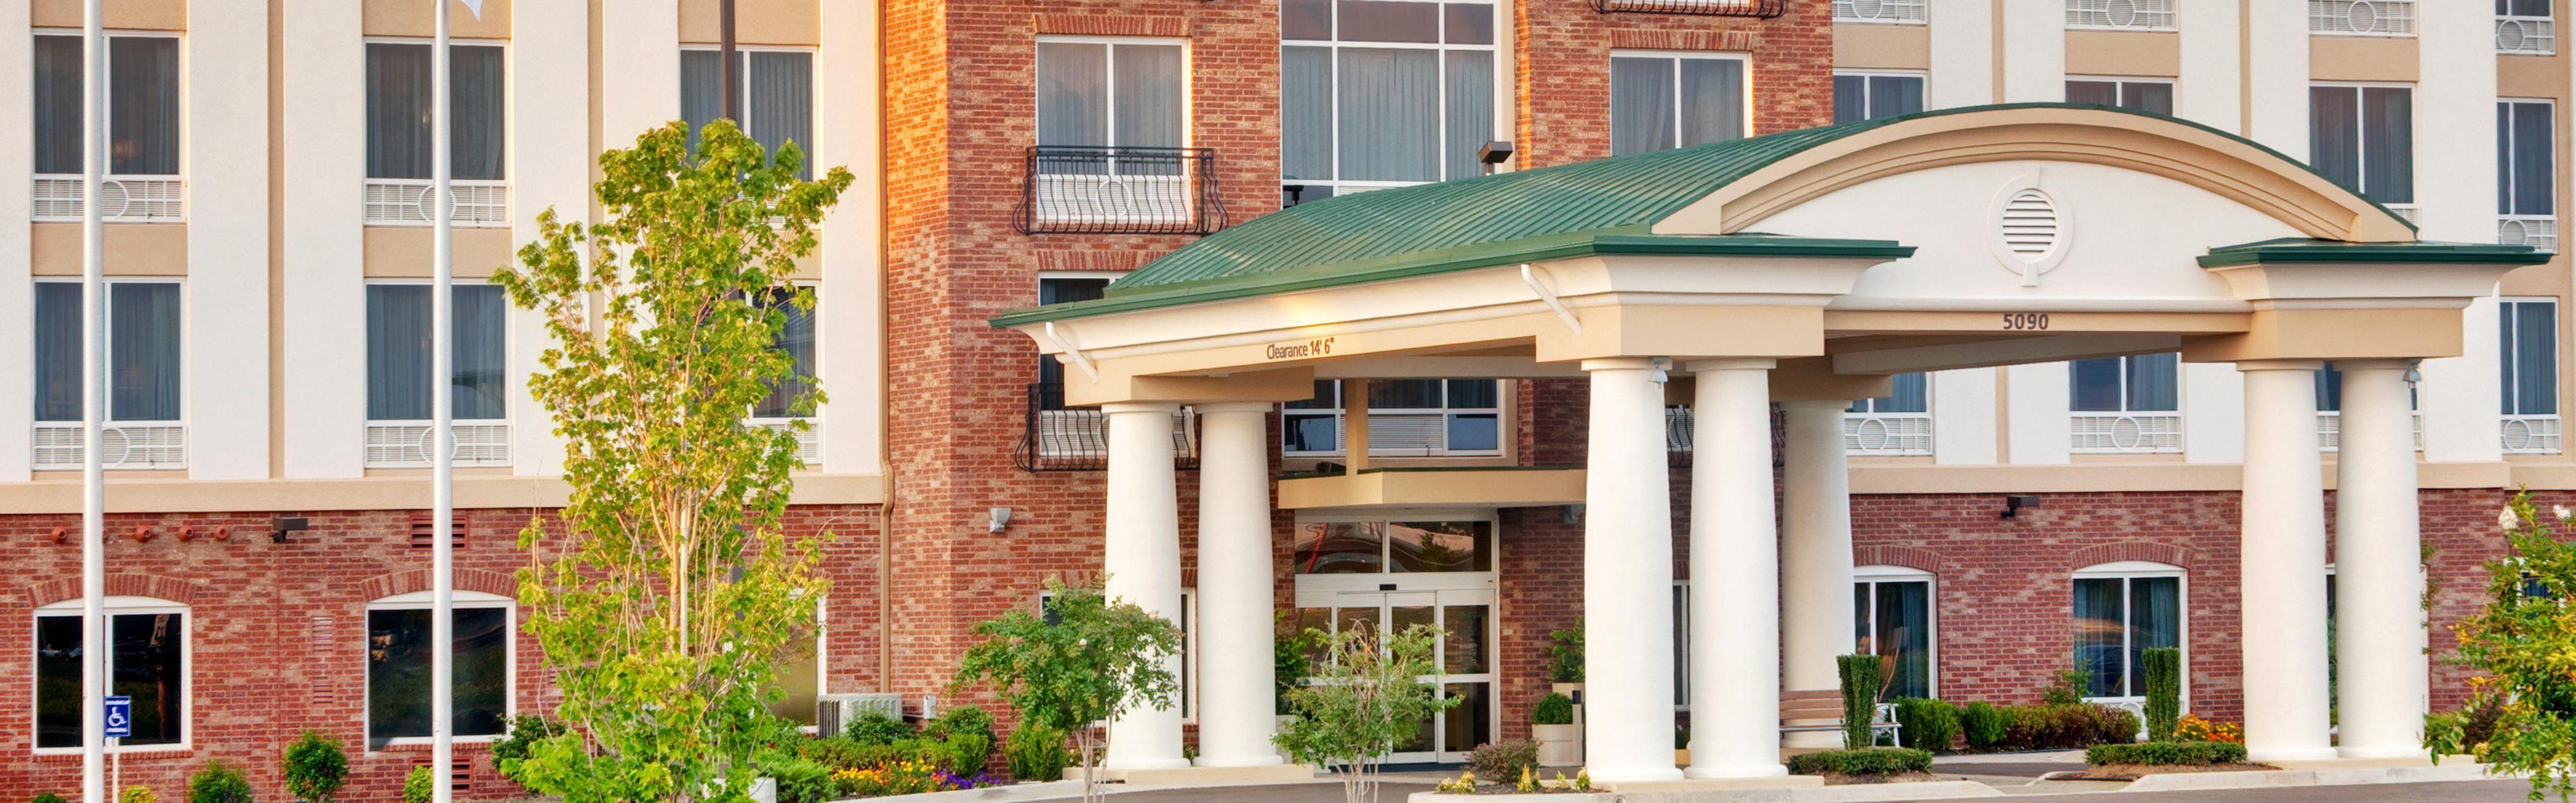 Holiday Inn Express Millington-Memphis Area image 0